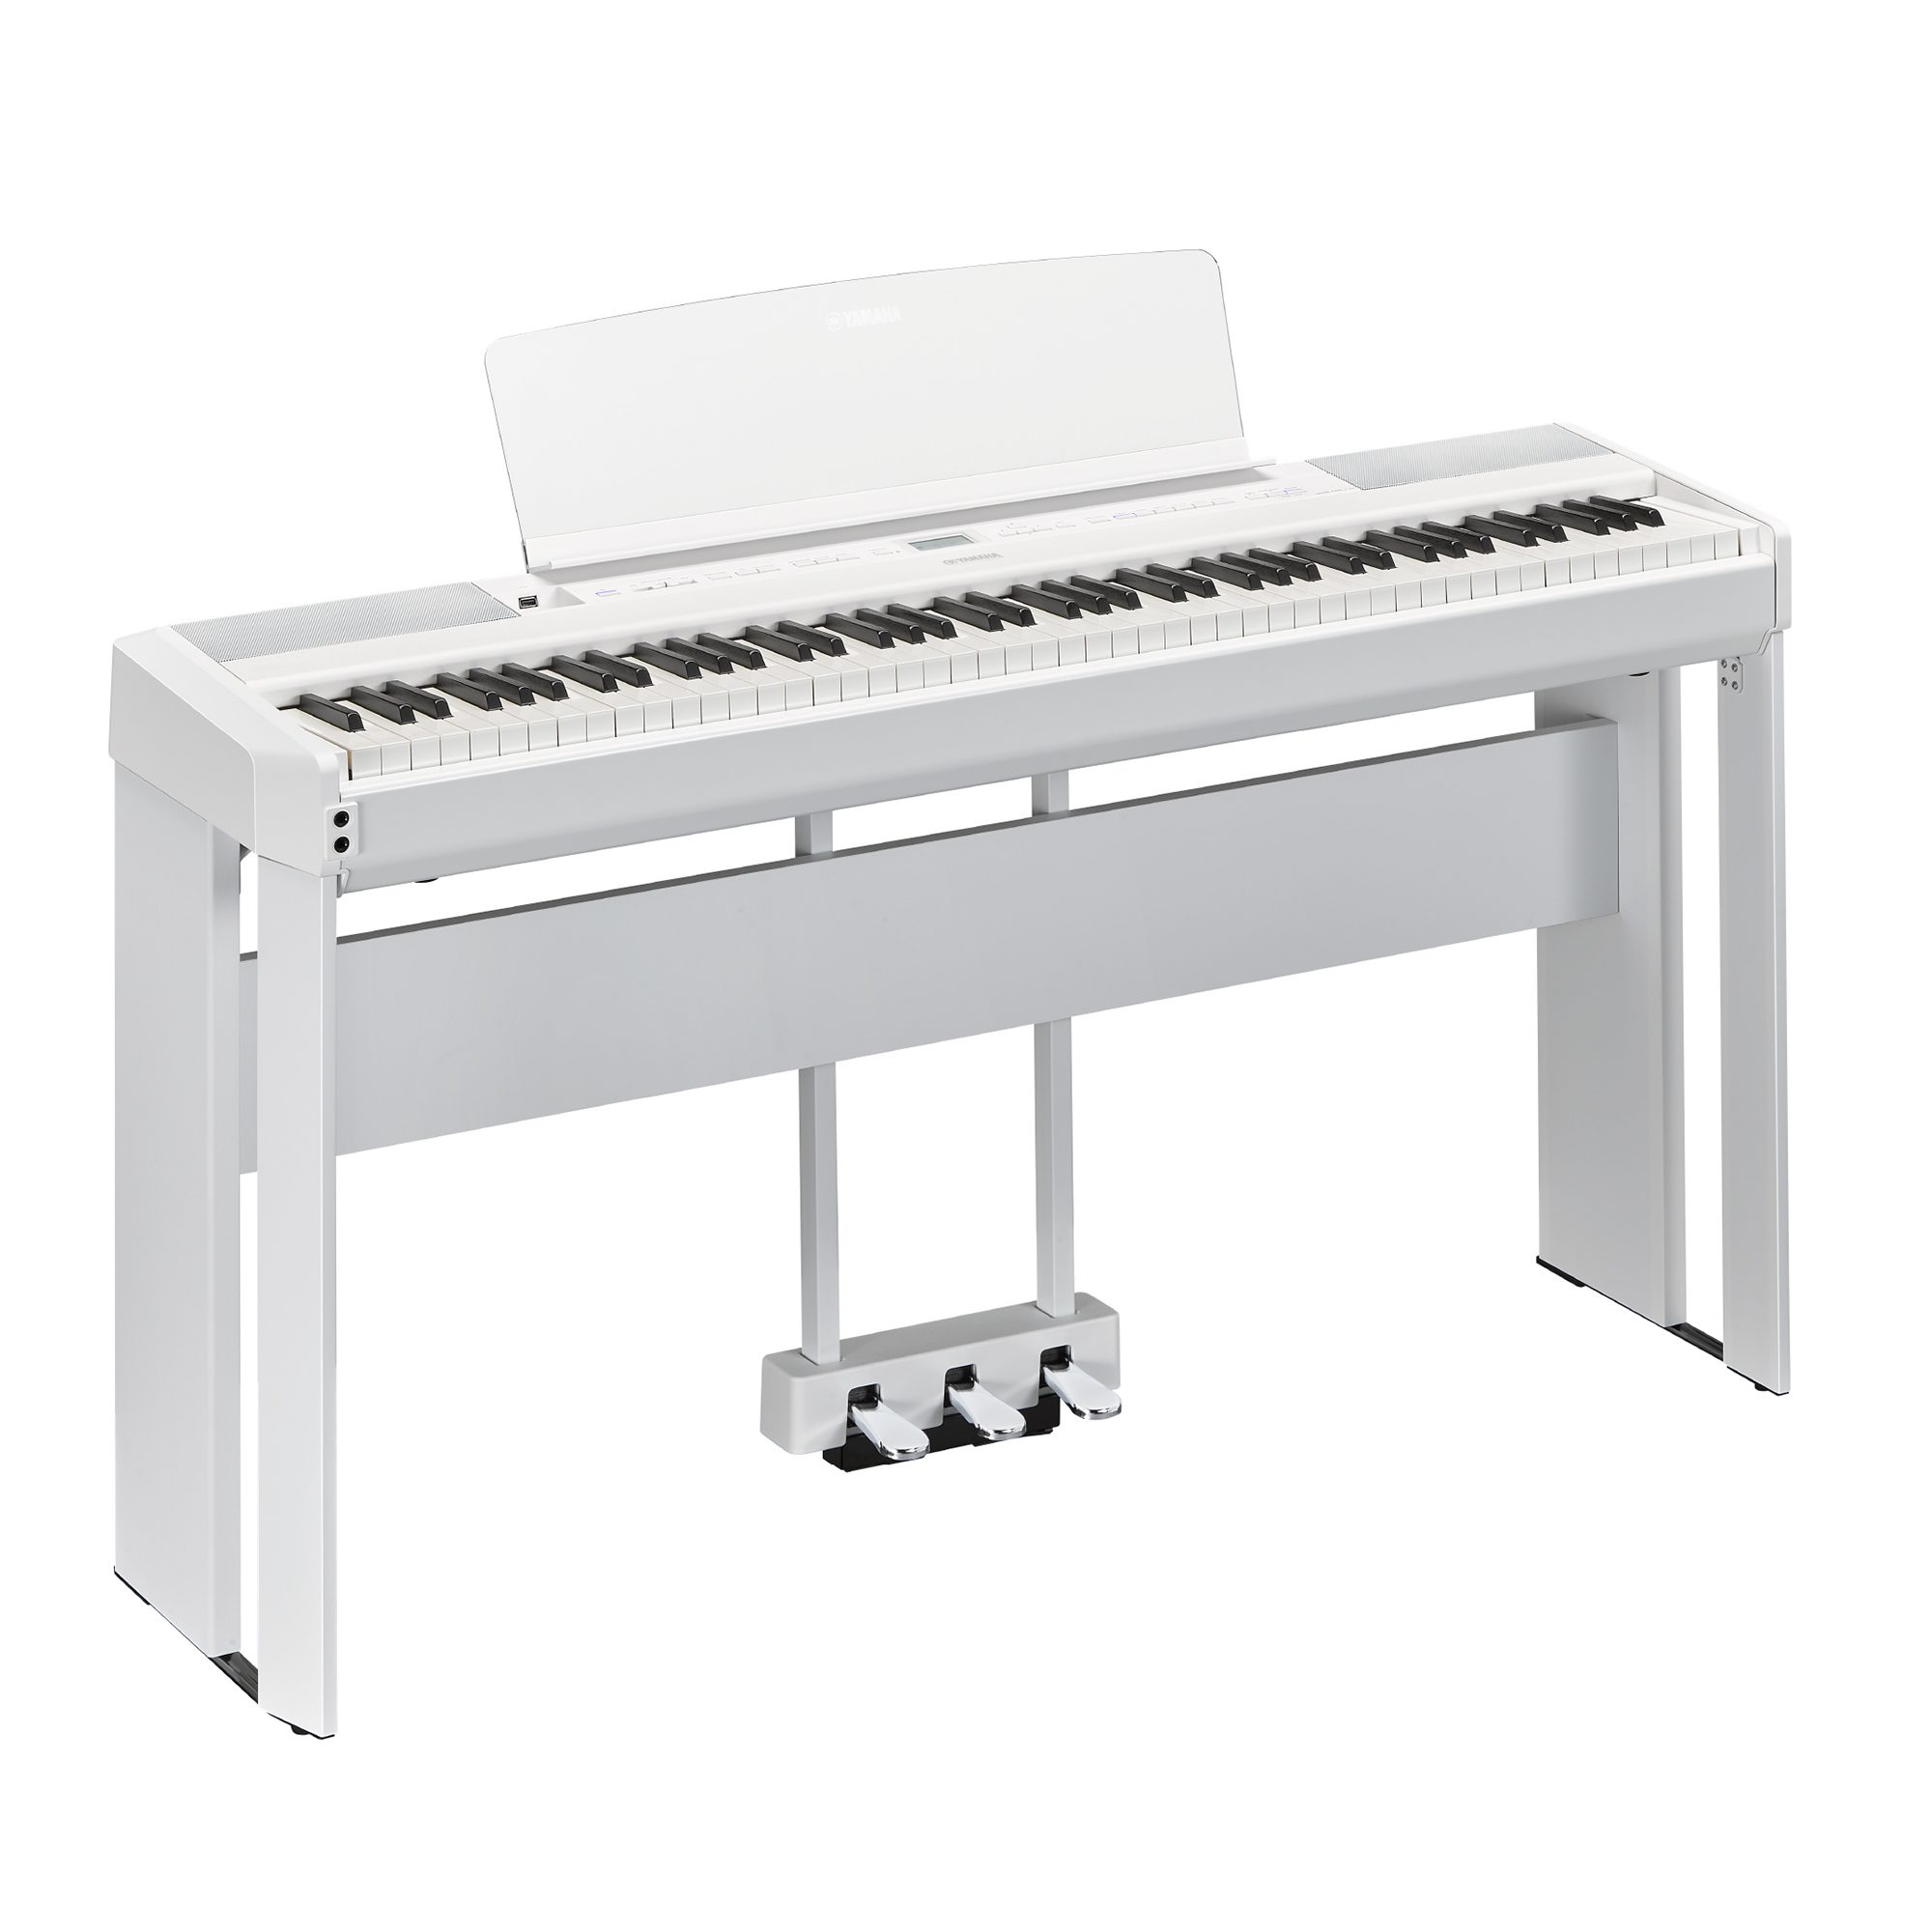 Design of Yamaha P515 Action Digital Piano